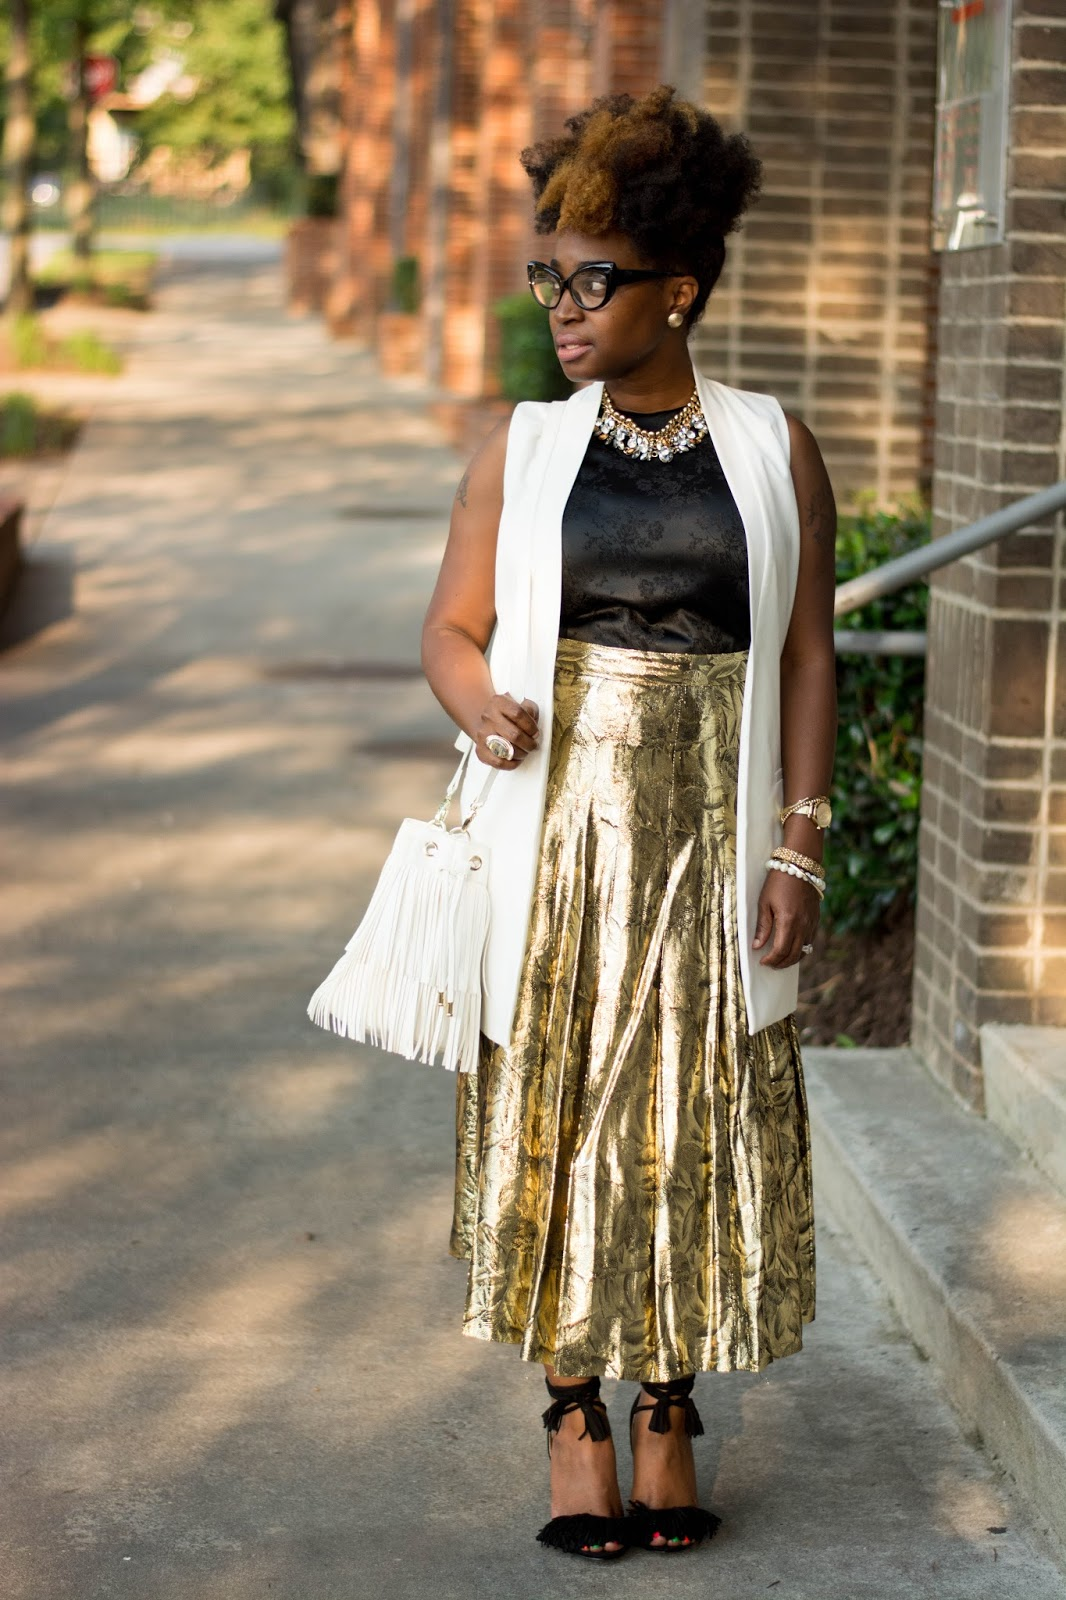 Atlanta style blogger, style blogger, Atlanta stylist, Street style, Vintage fashion, Metallic gold skirt, Fringe sandals, Cream vest, Target style, Thrifted fashion, Shoedazzle, Justfab, Atlanta influencer, Style influencer, fringe bucket handbag, Black girls rock, Black blogger, Browngirls, Natural Hair styles, Black girls killing it, Black girl fashion, Fashion style, Wardrobe stylist, Atlanta street style, Atlanta style